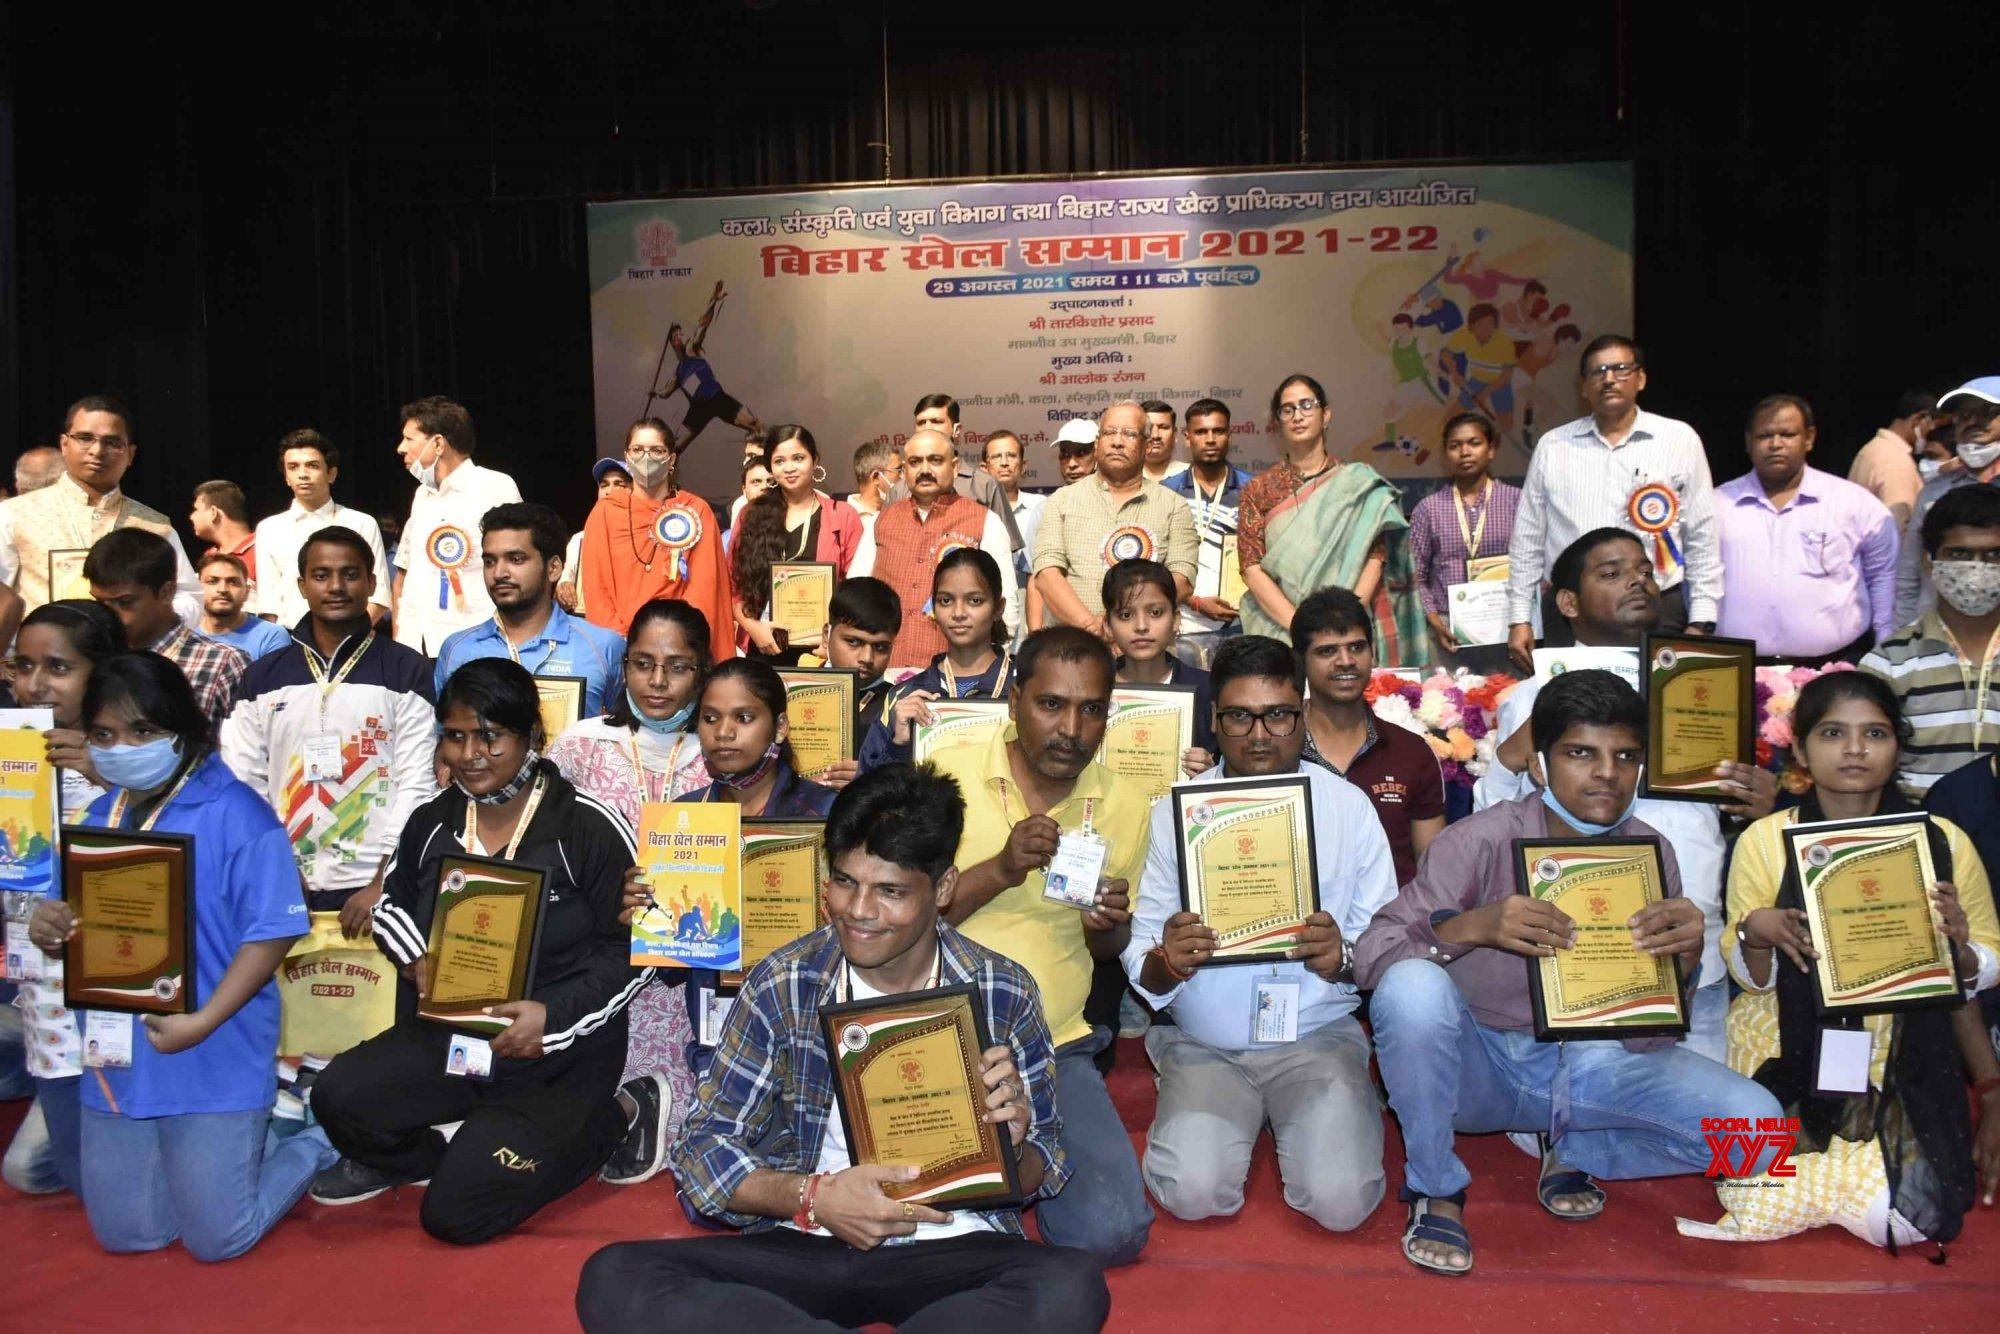 Patna: Bihar Deputy Chief Minister Tarkishore Prasad release a calendar during the sports honor ceremony at Premchand Rangshala in Patna. #Gallery